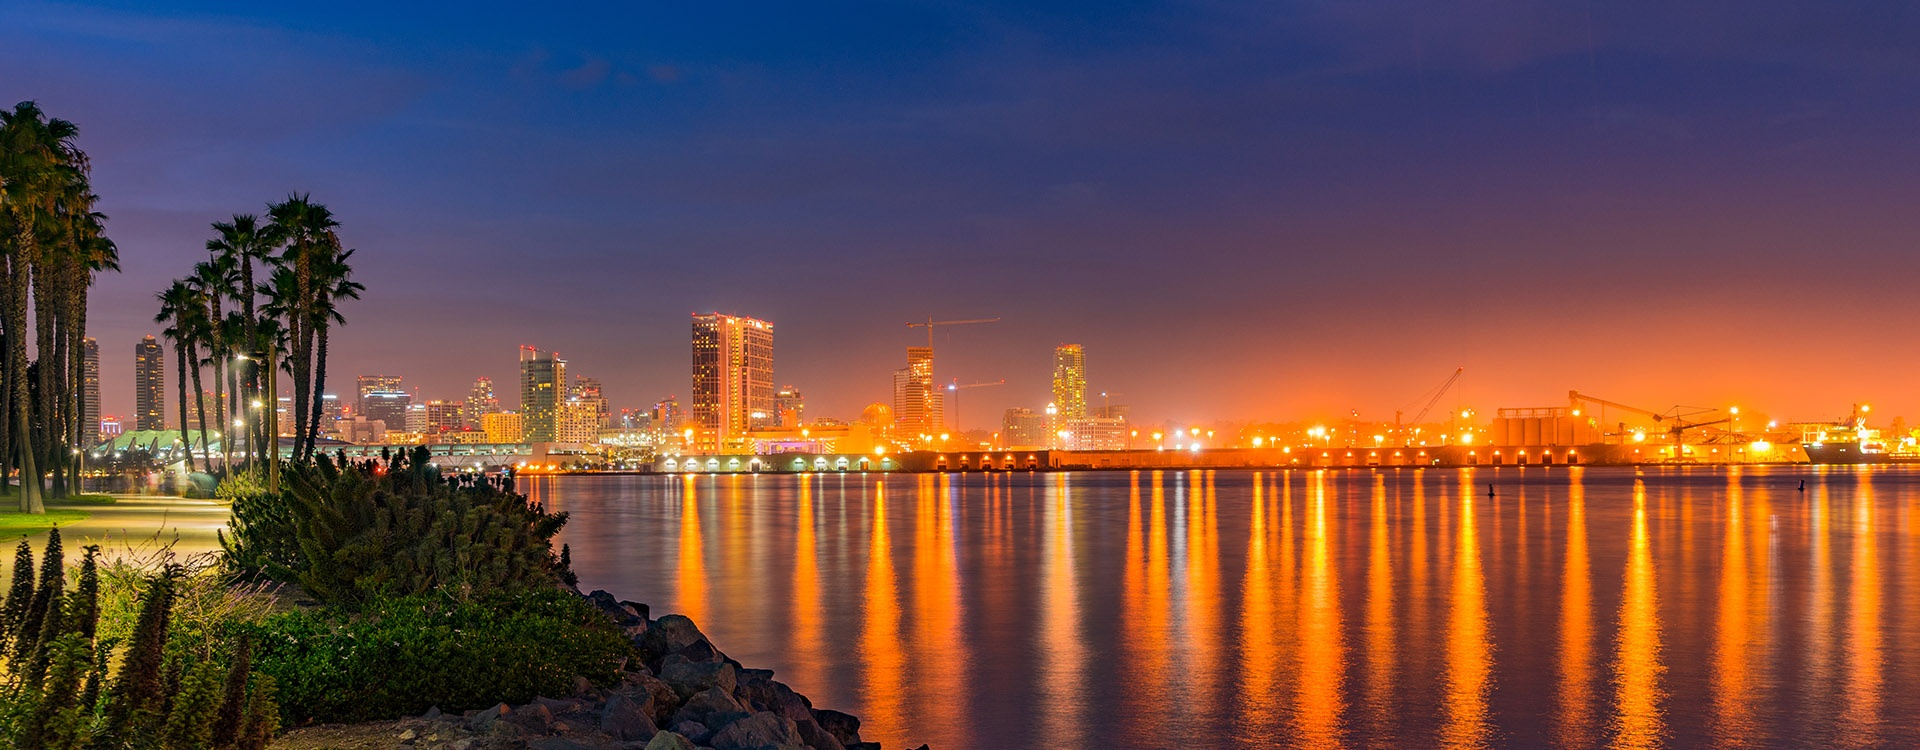 miniCUP - San Diego| Oct. 2, 2018